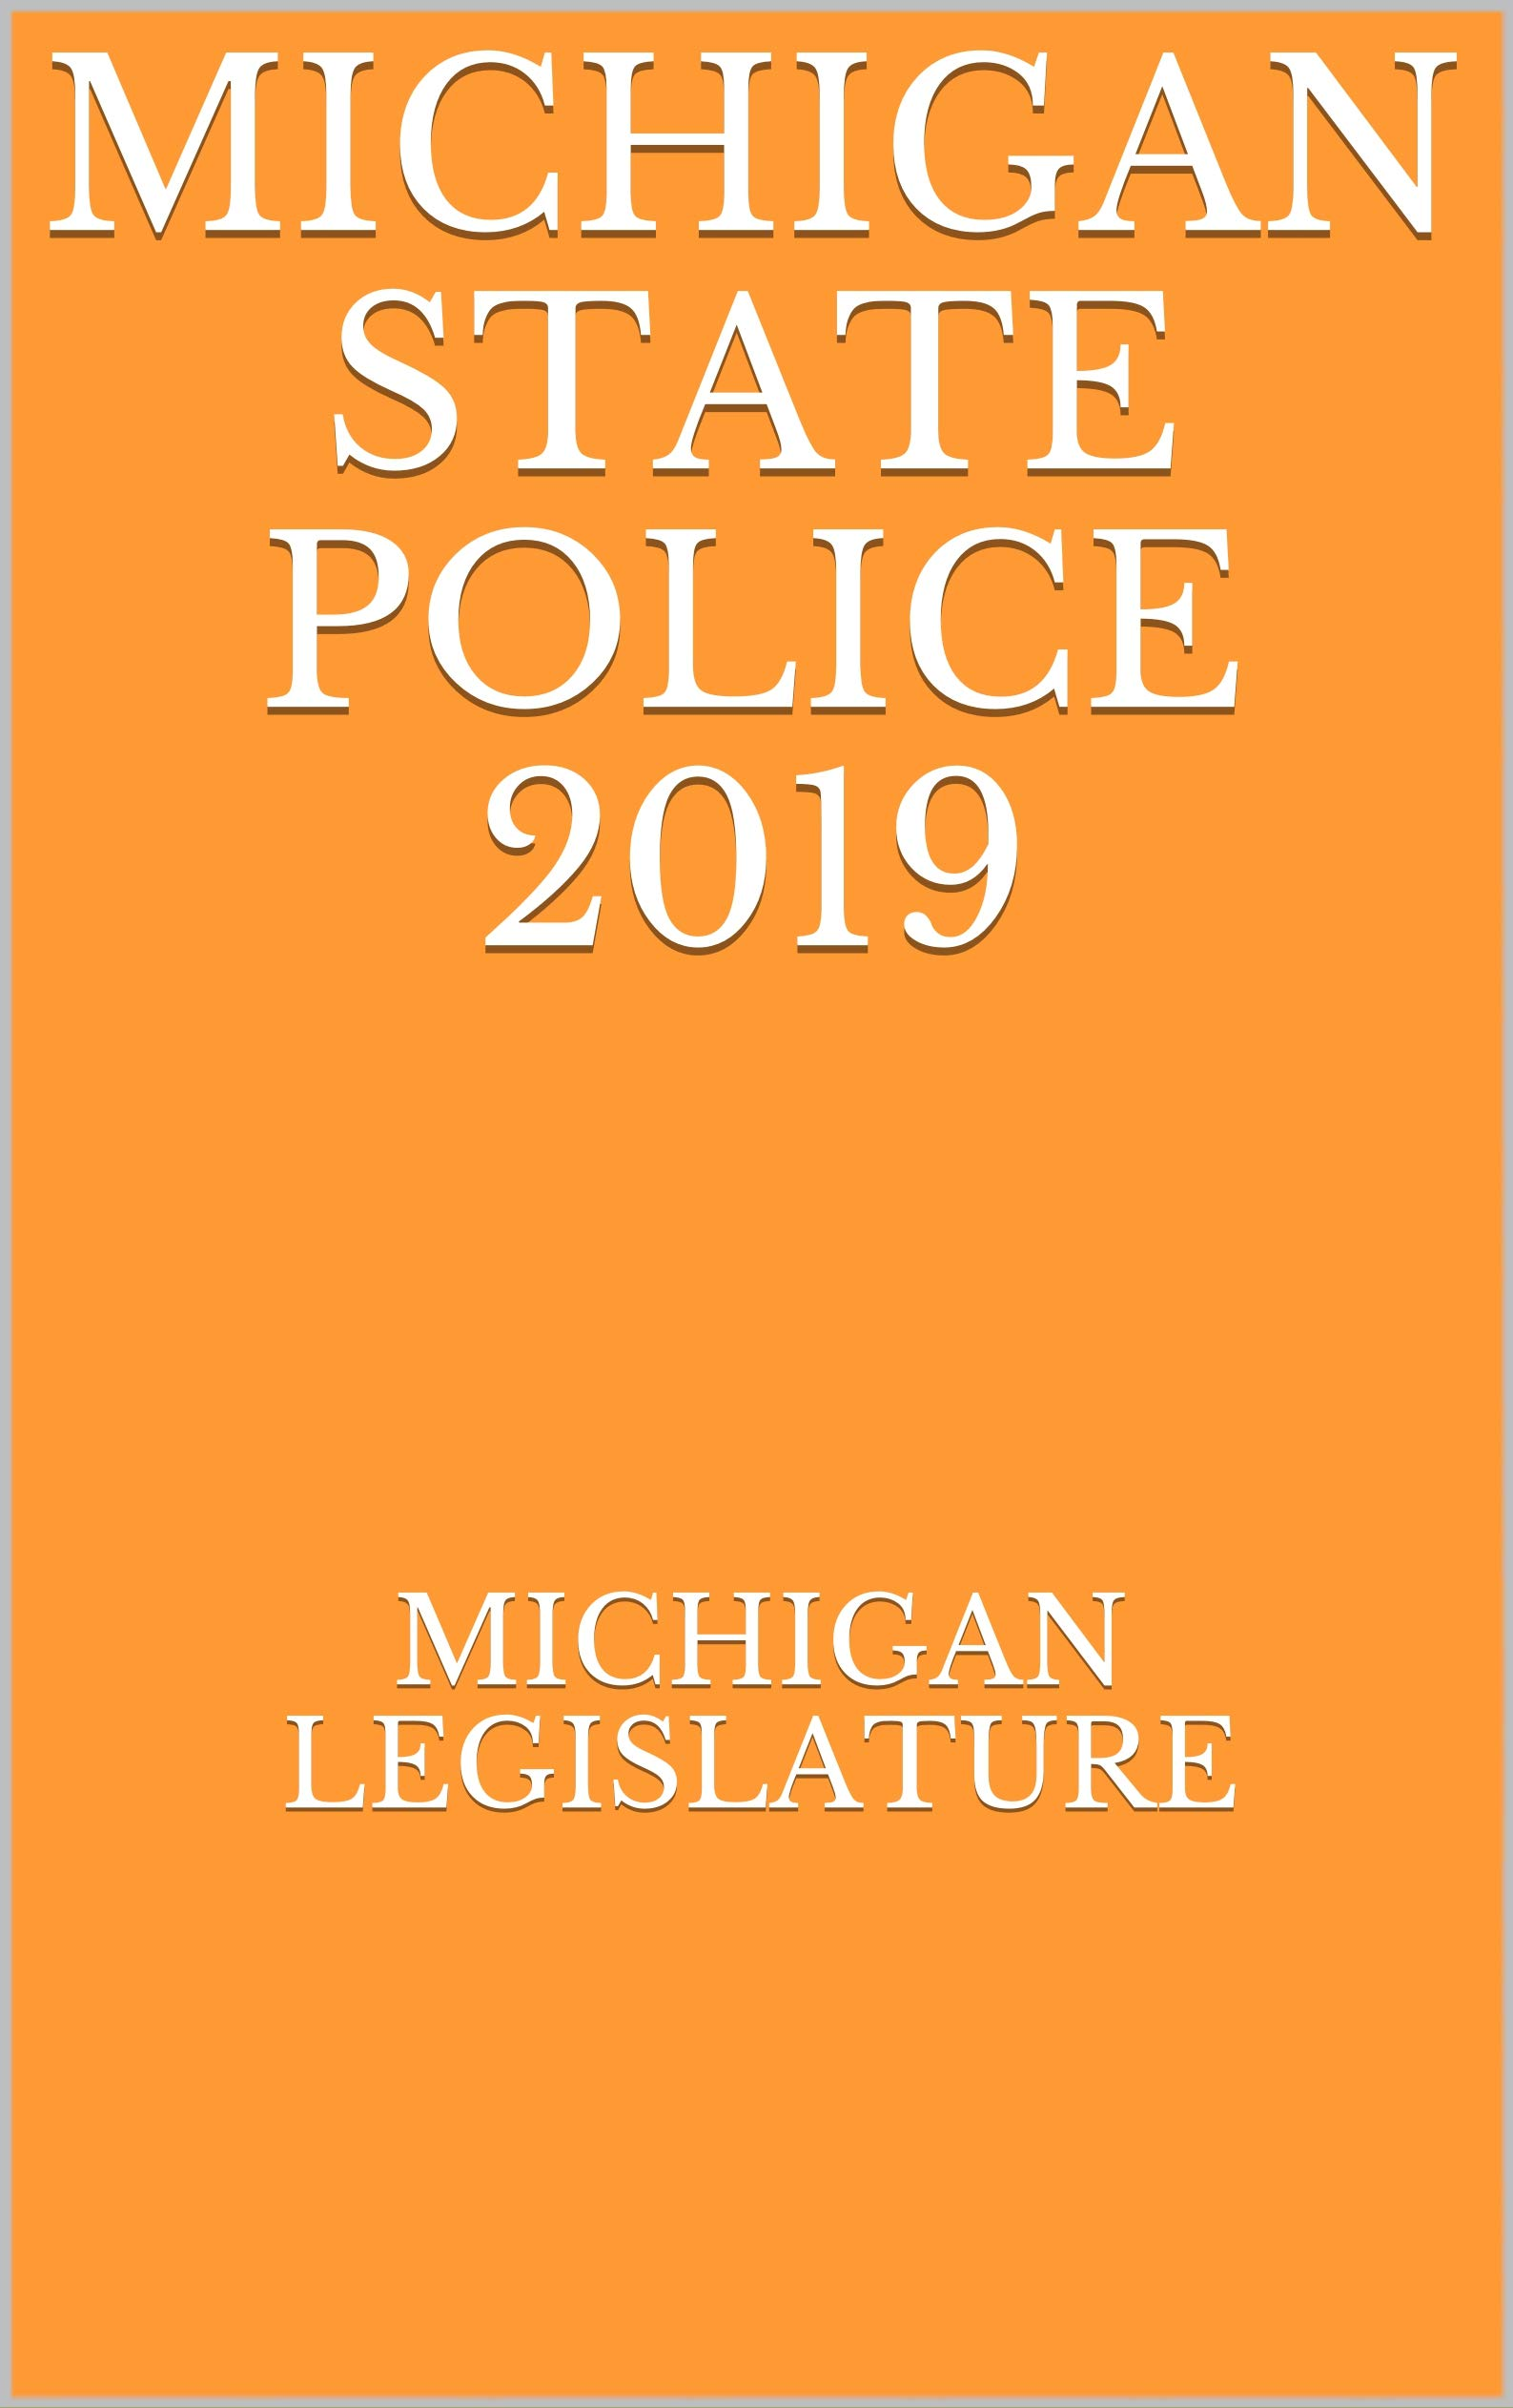 MICHIGAN STATE POLICE 2019